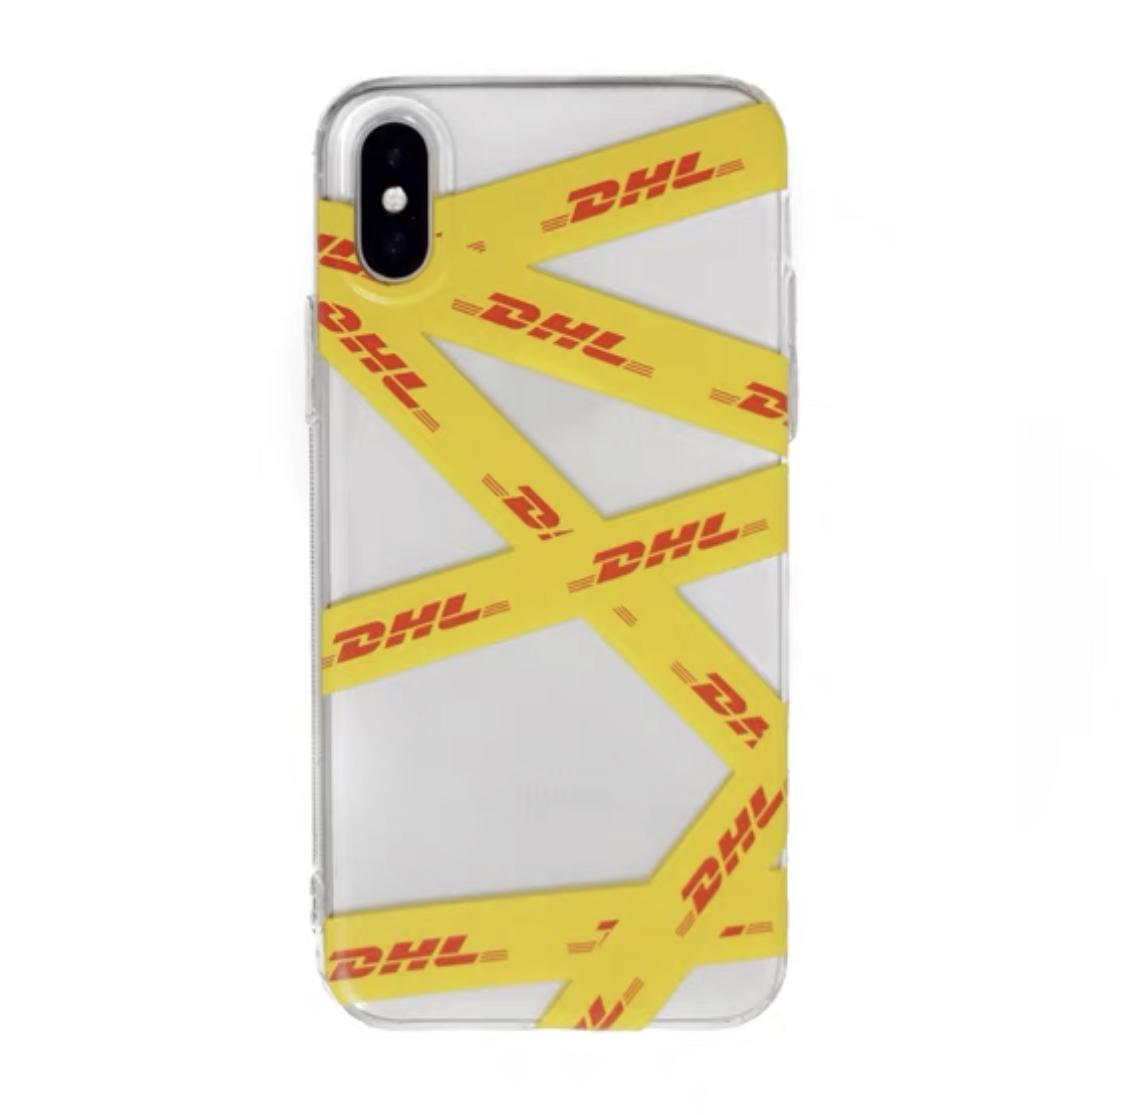 DHL PHONE CASE